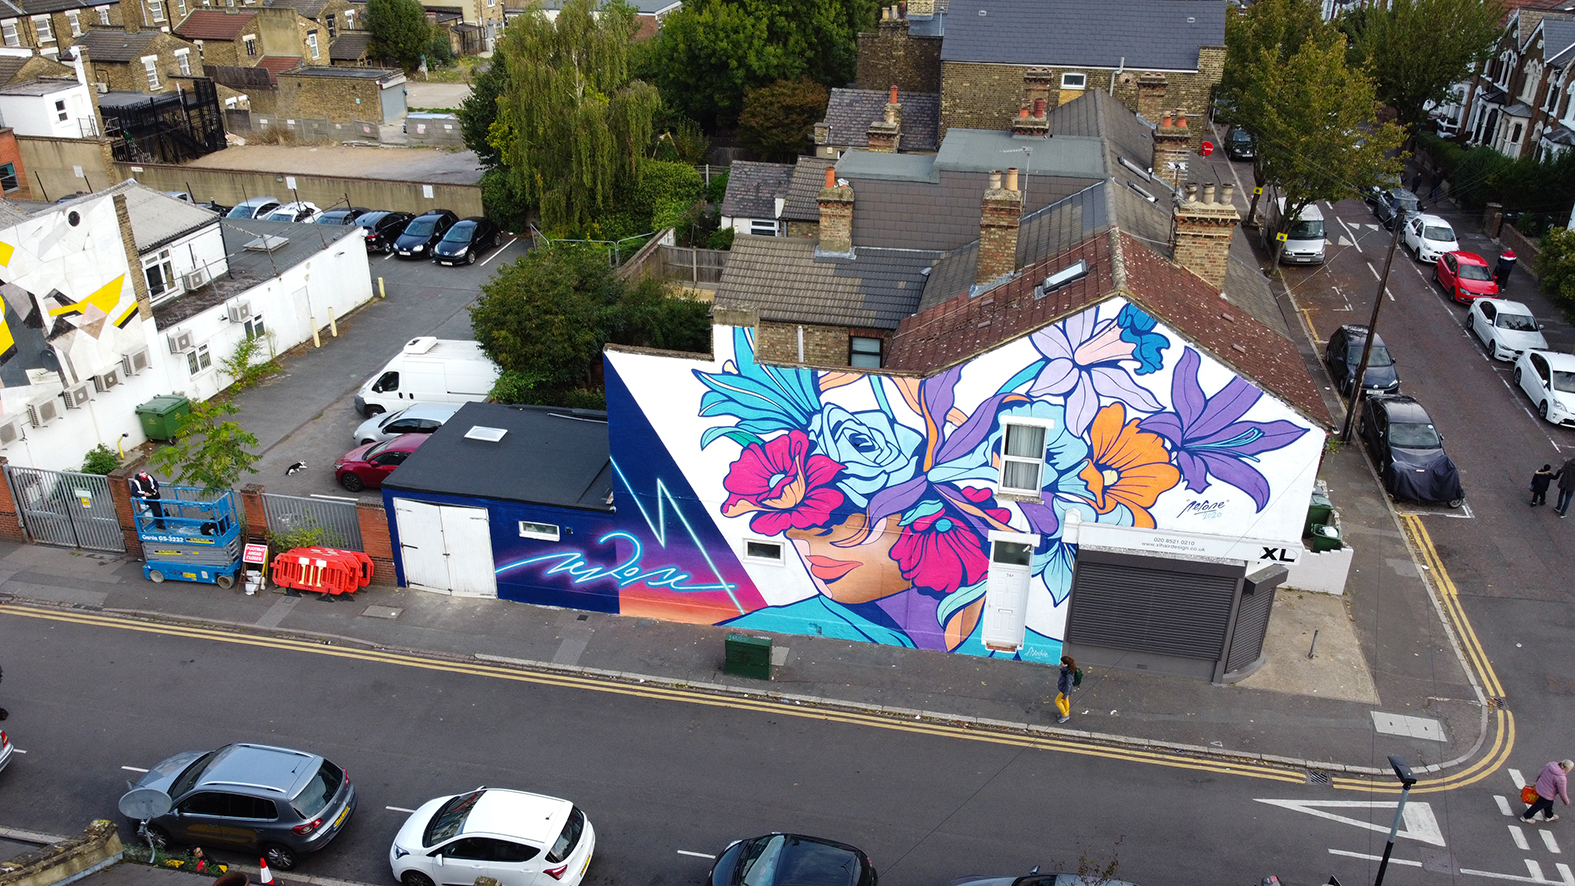 NERONE-mural-london-street-art-4